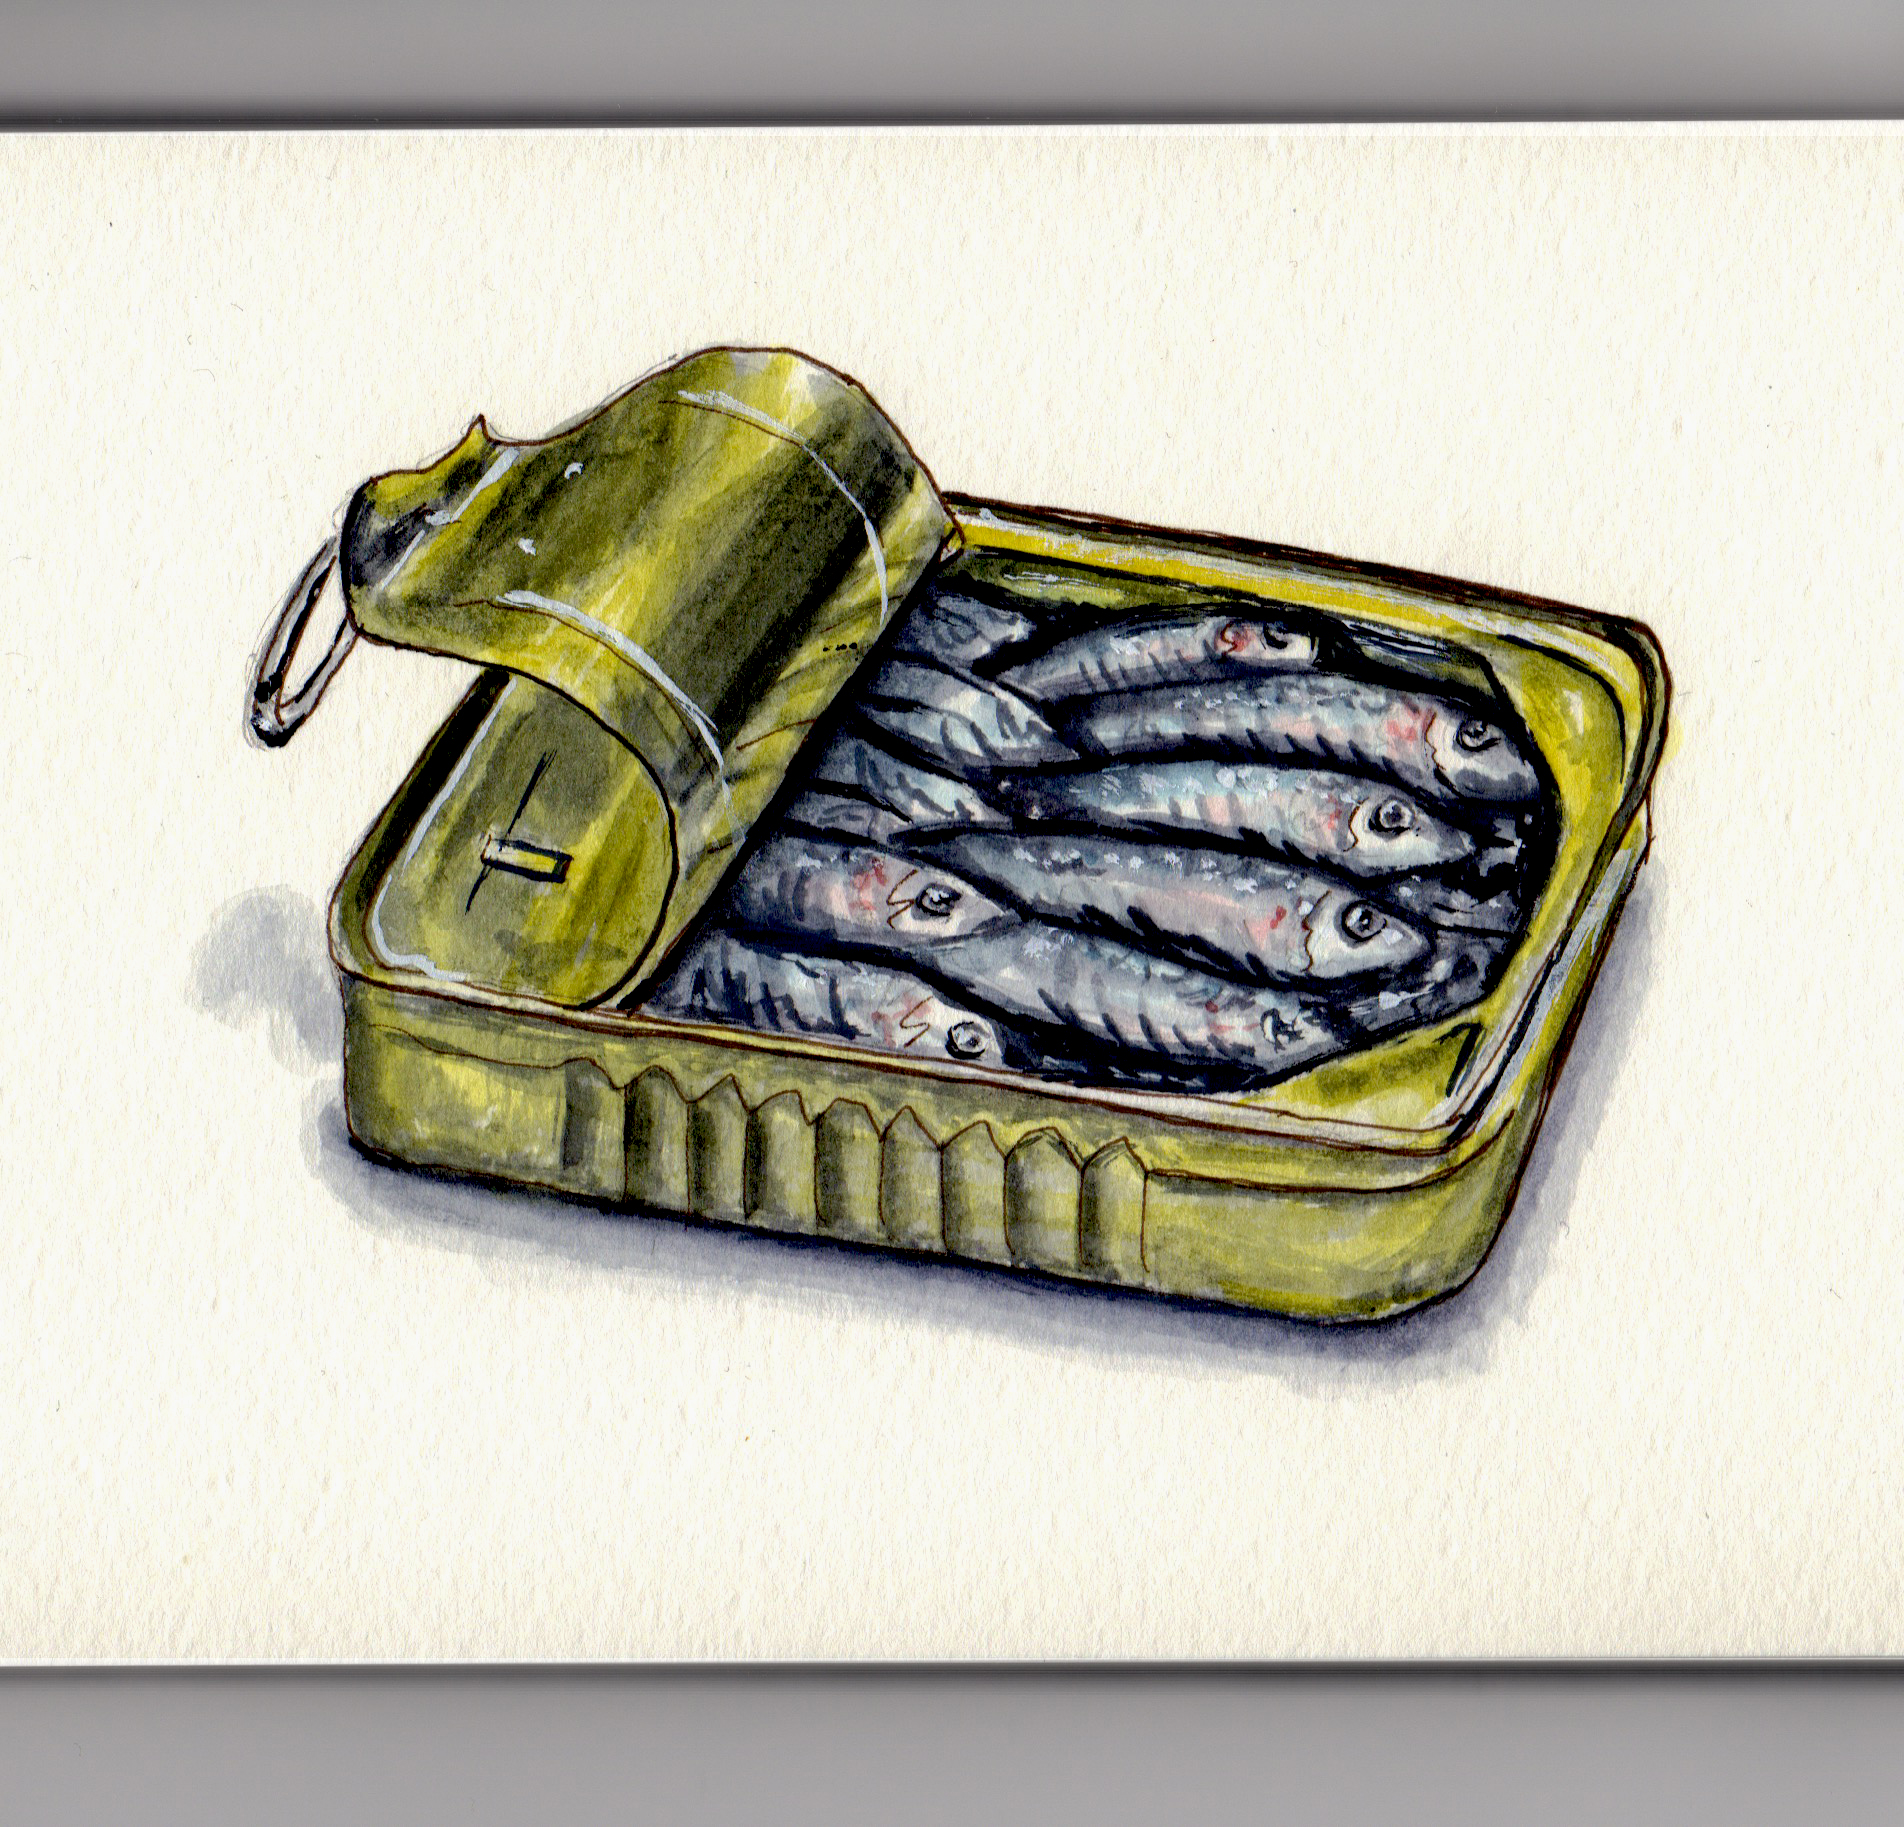 National Sardines Day